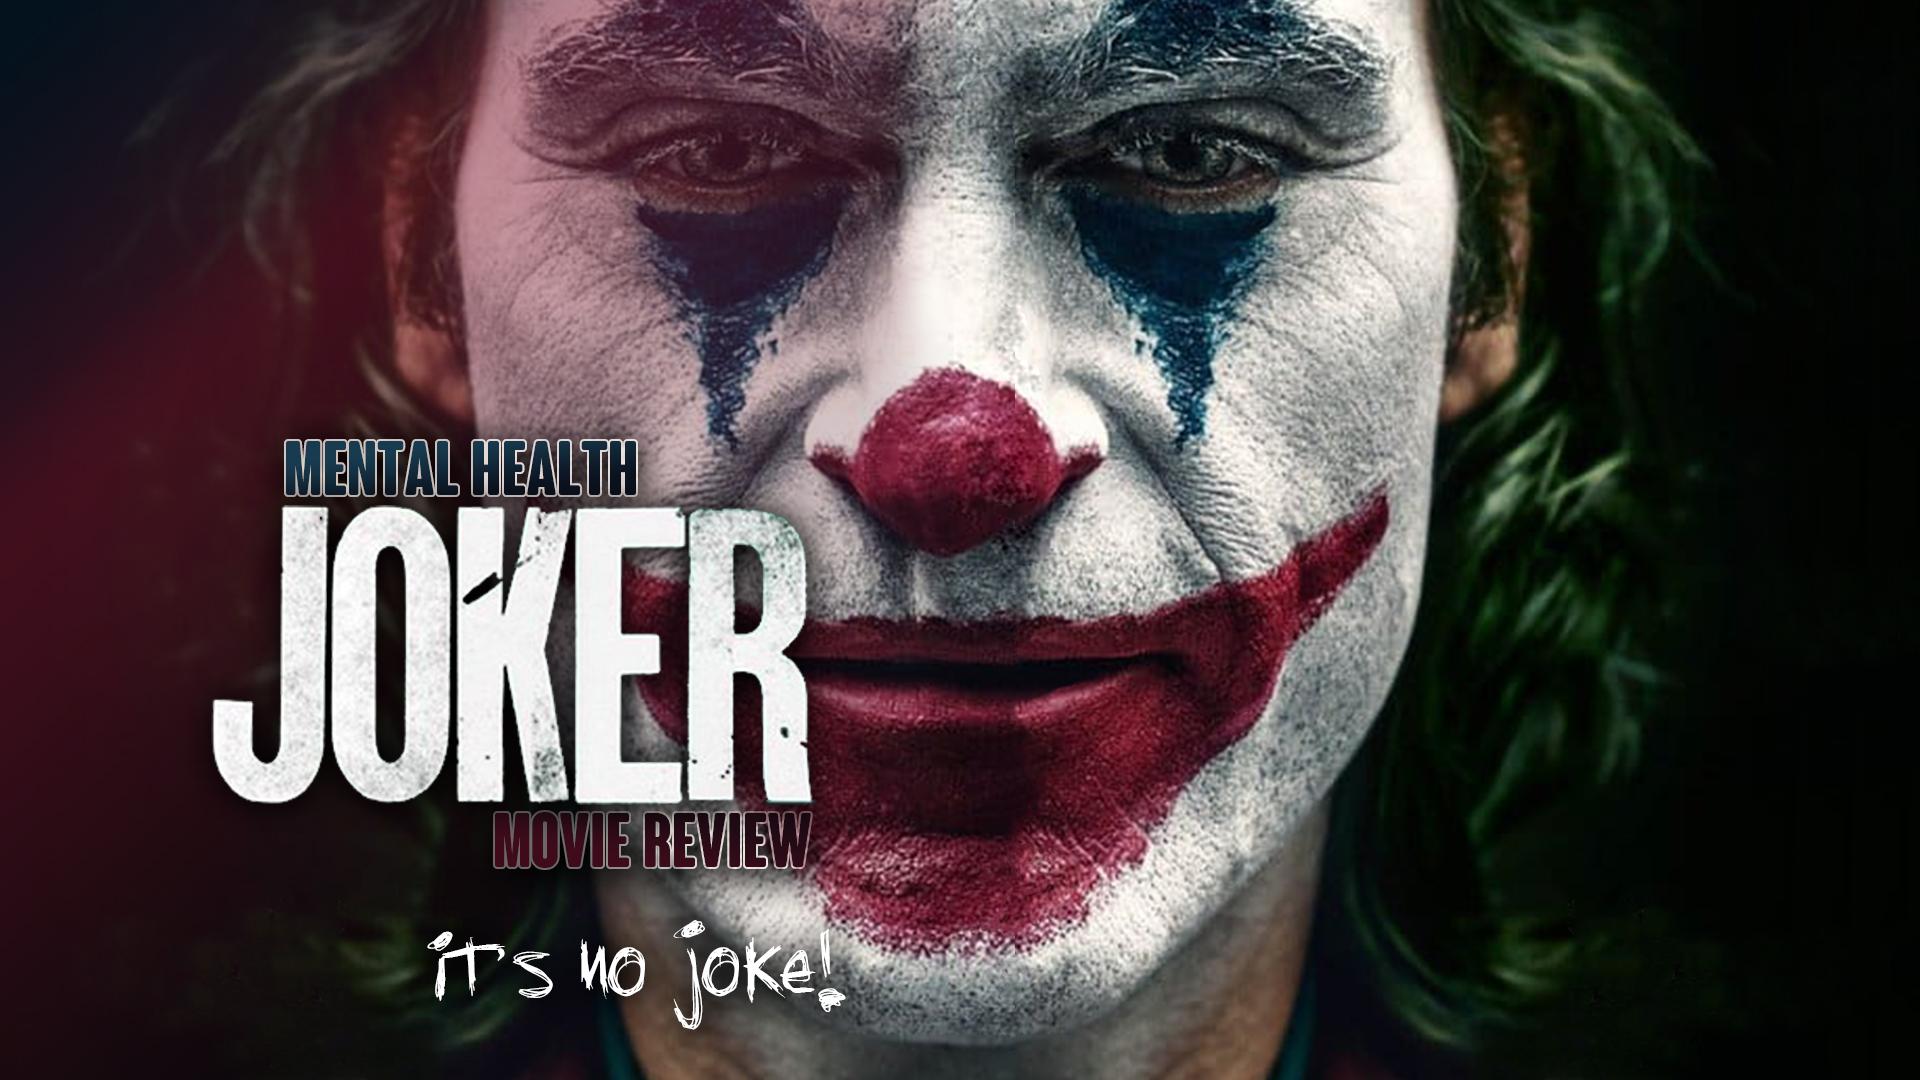 Mental Health Movie Review Joker Is No Joke Nami Ccns